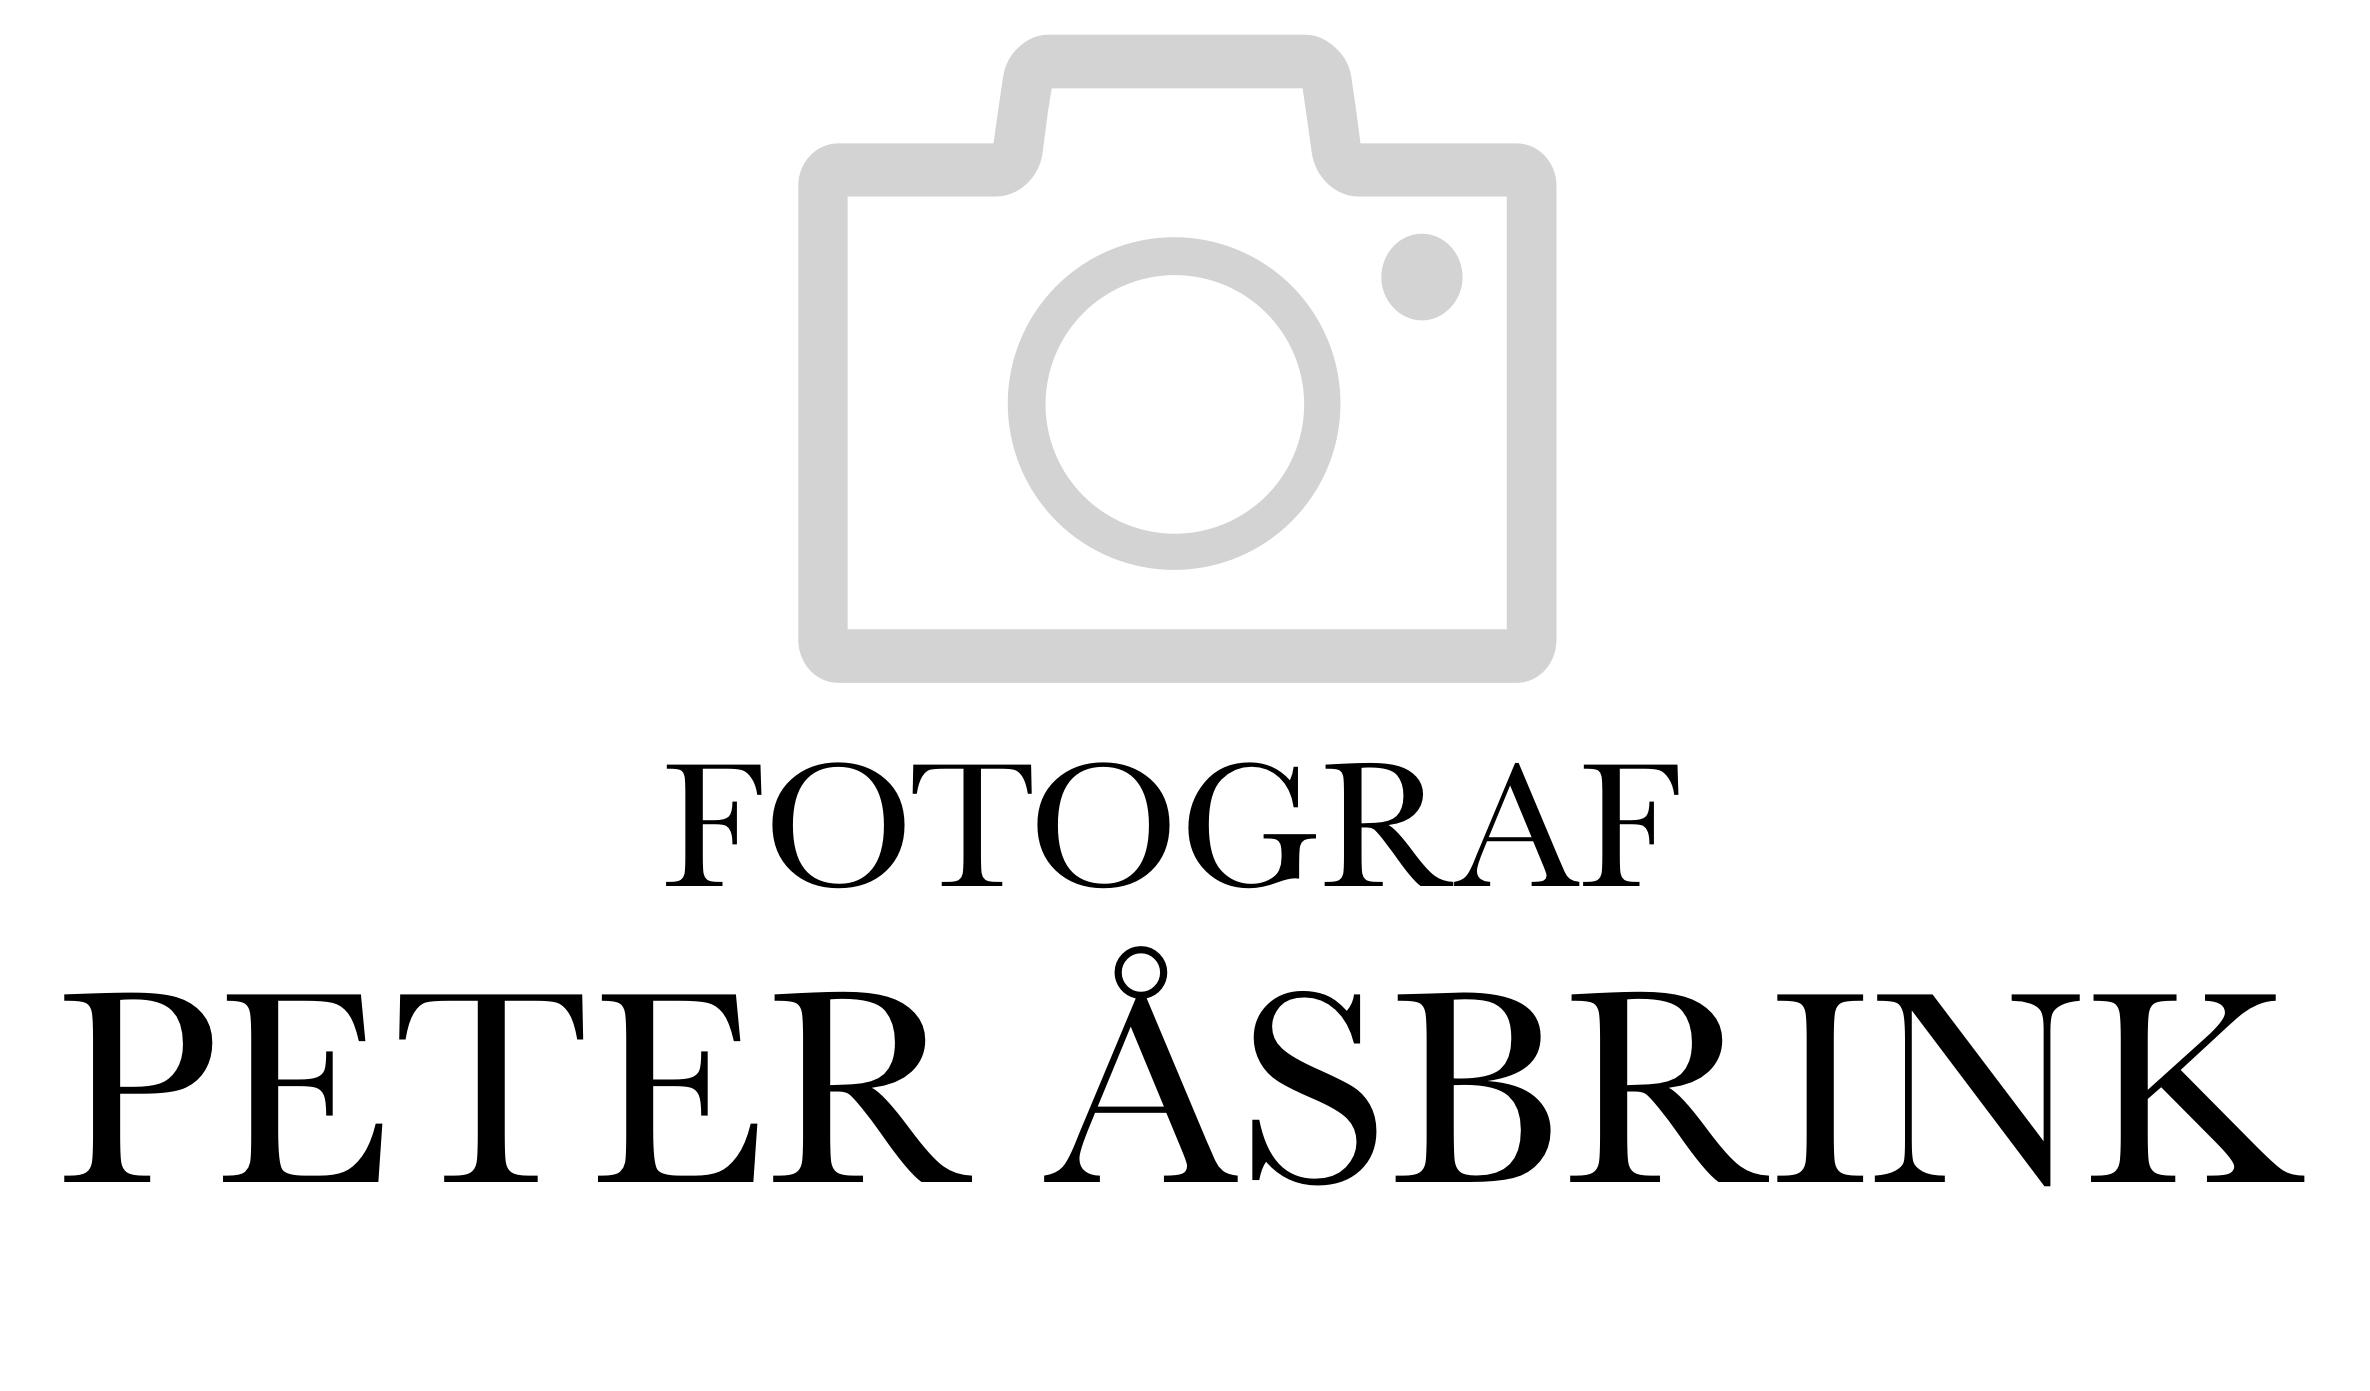 Fotograf Peter Åsbrink